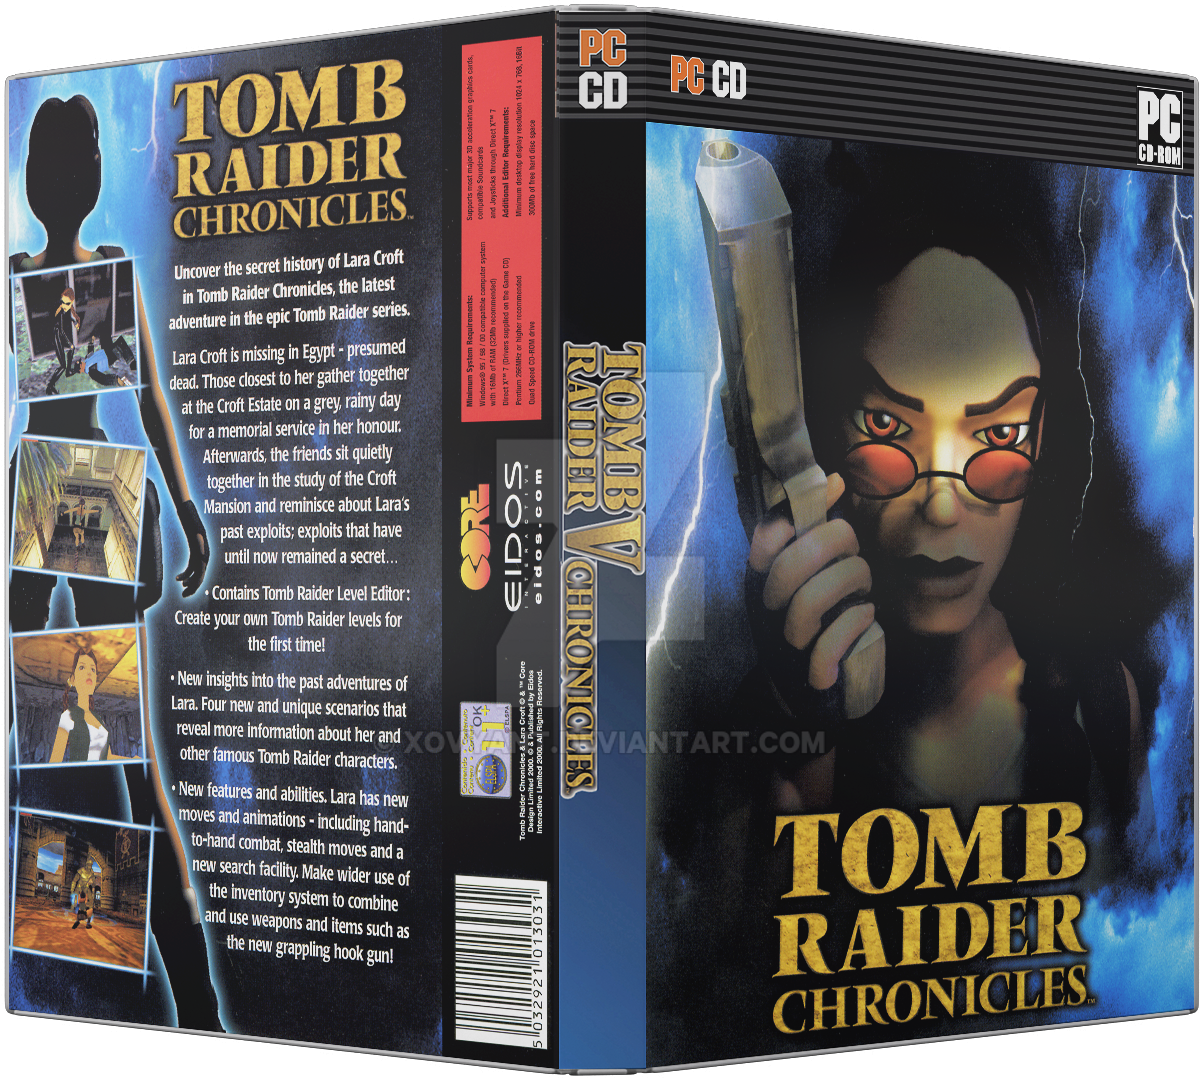 tomb raider chronicles gb pc dvd cover by xovyant on deviantart